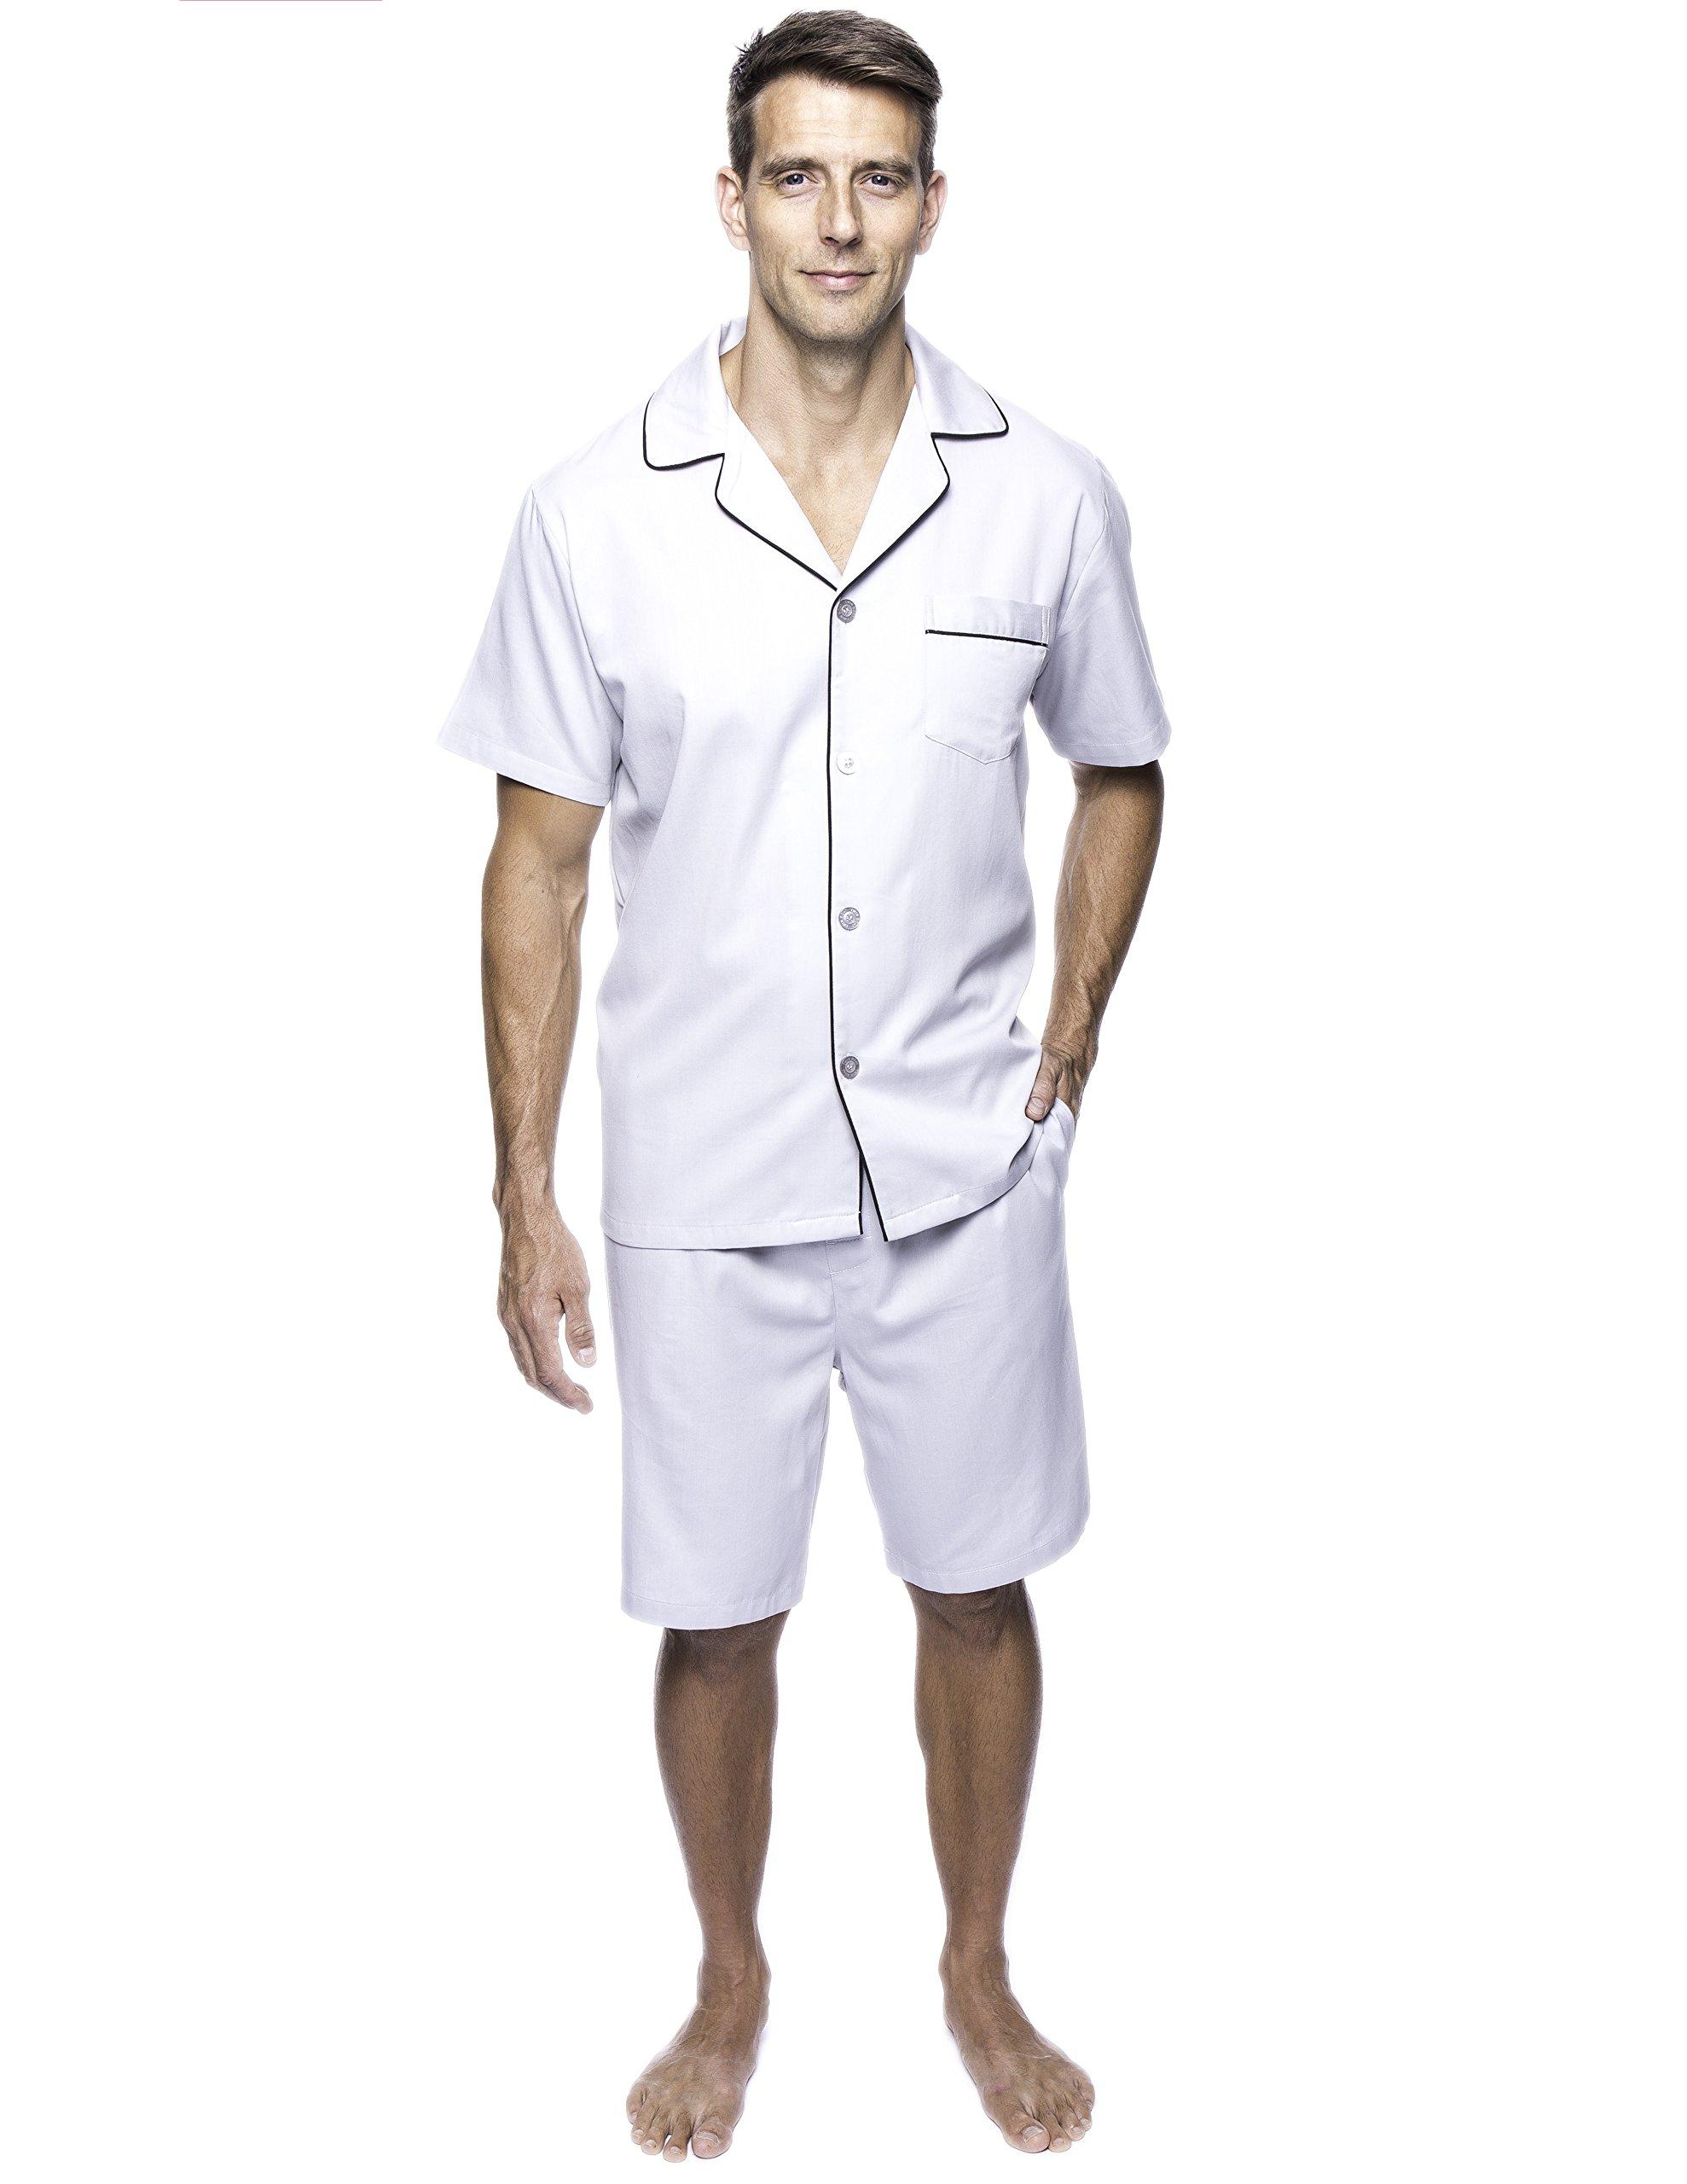 Noble Mount Twin Boat Men's Cotton Short Pajama Set - Light Grey - X-Large